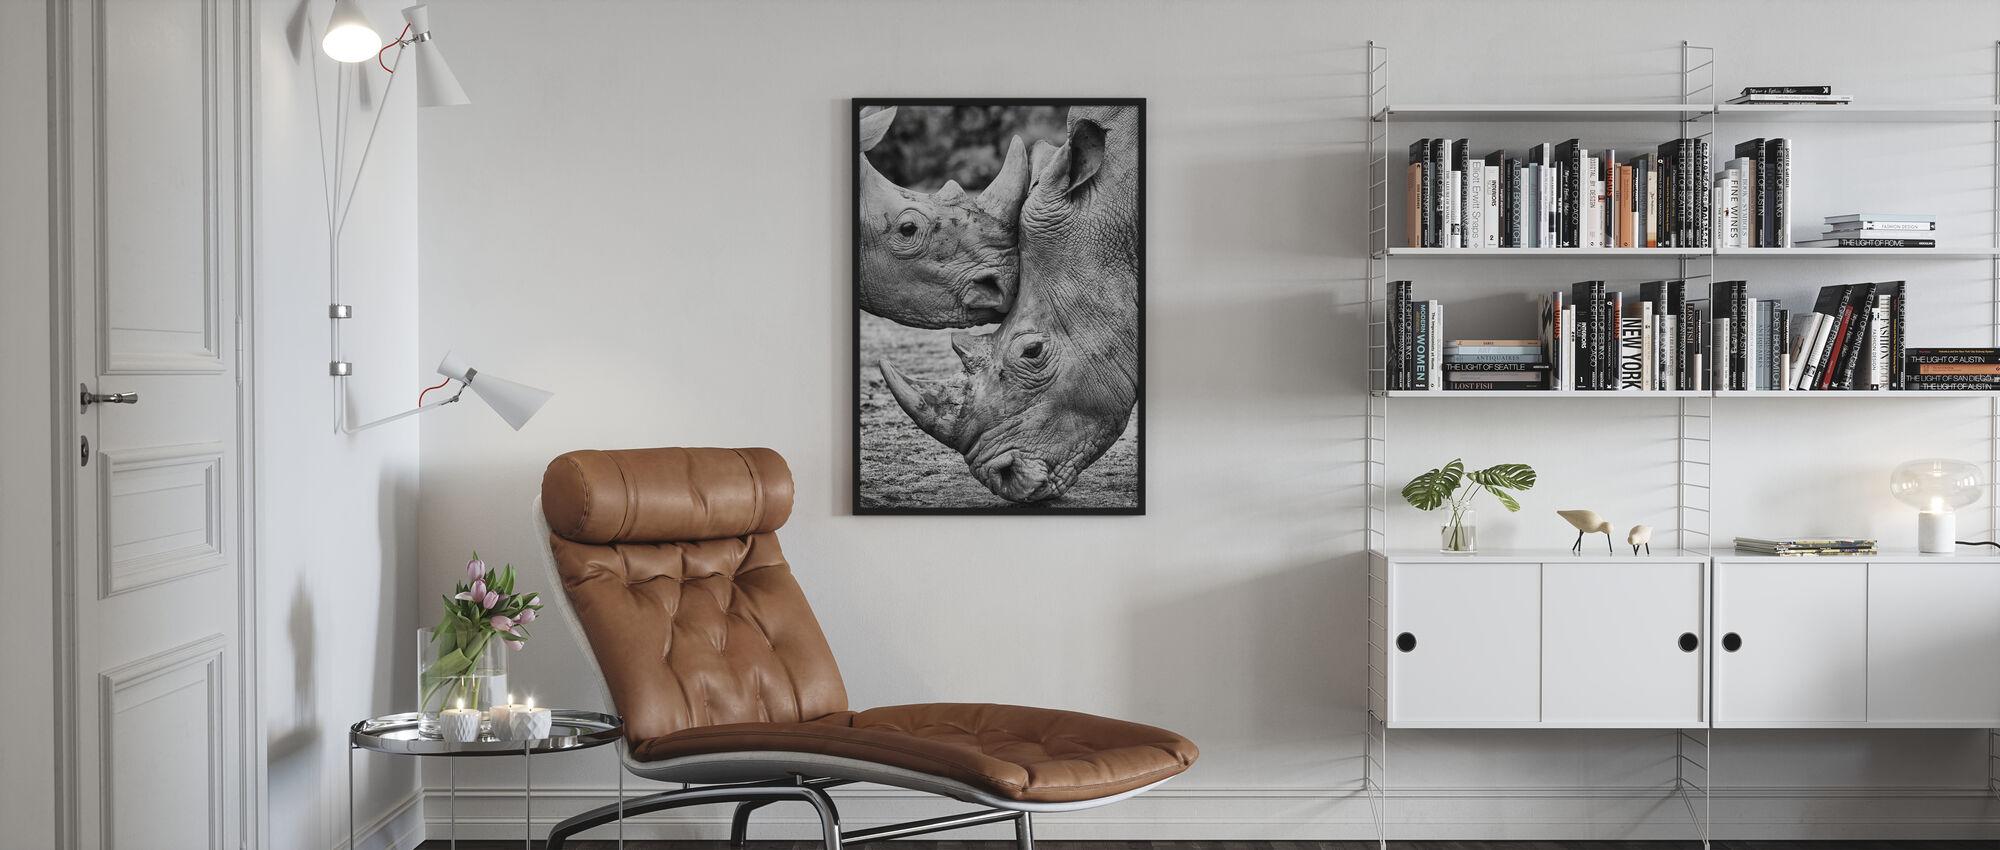 Ansikte mot ansikte - Inramad tavla - Vardagsrum